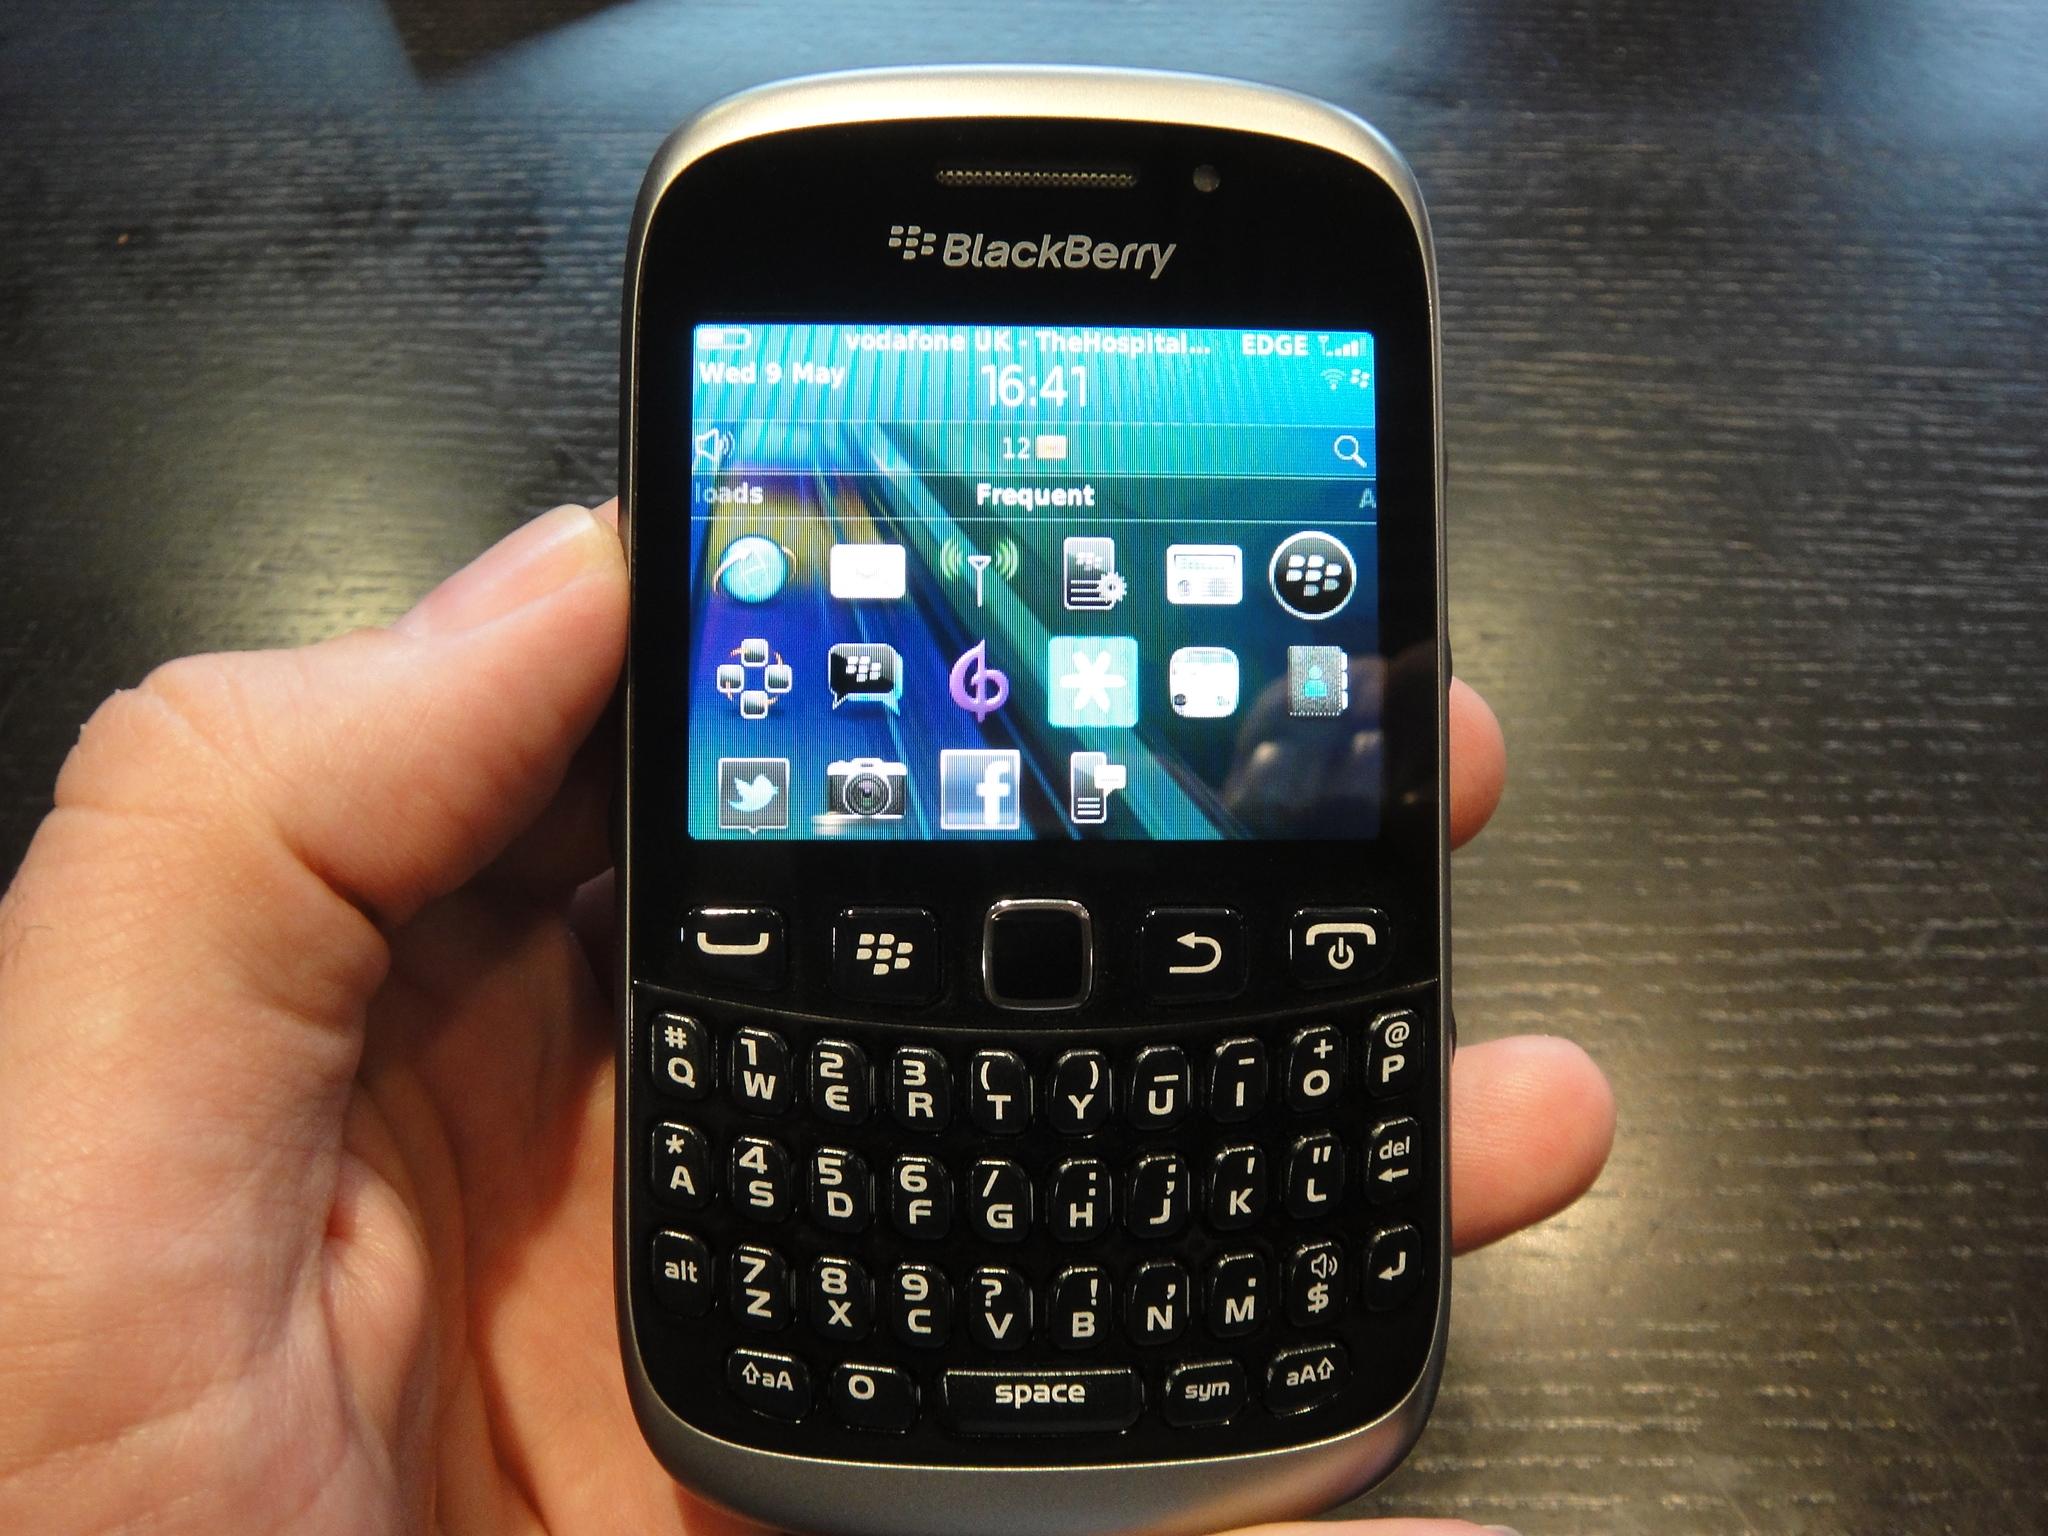 download camera flash for blackberry 8520